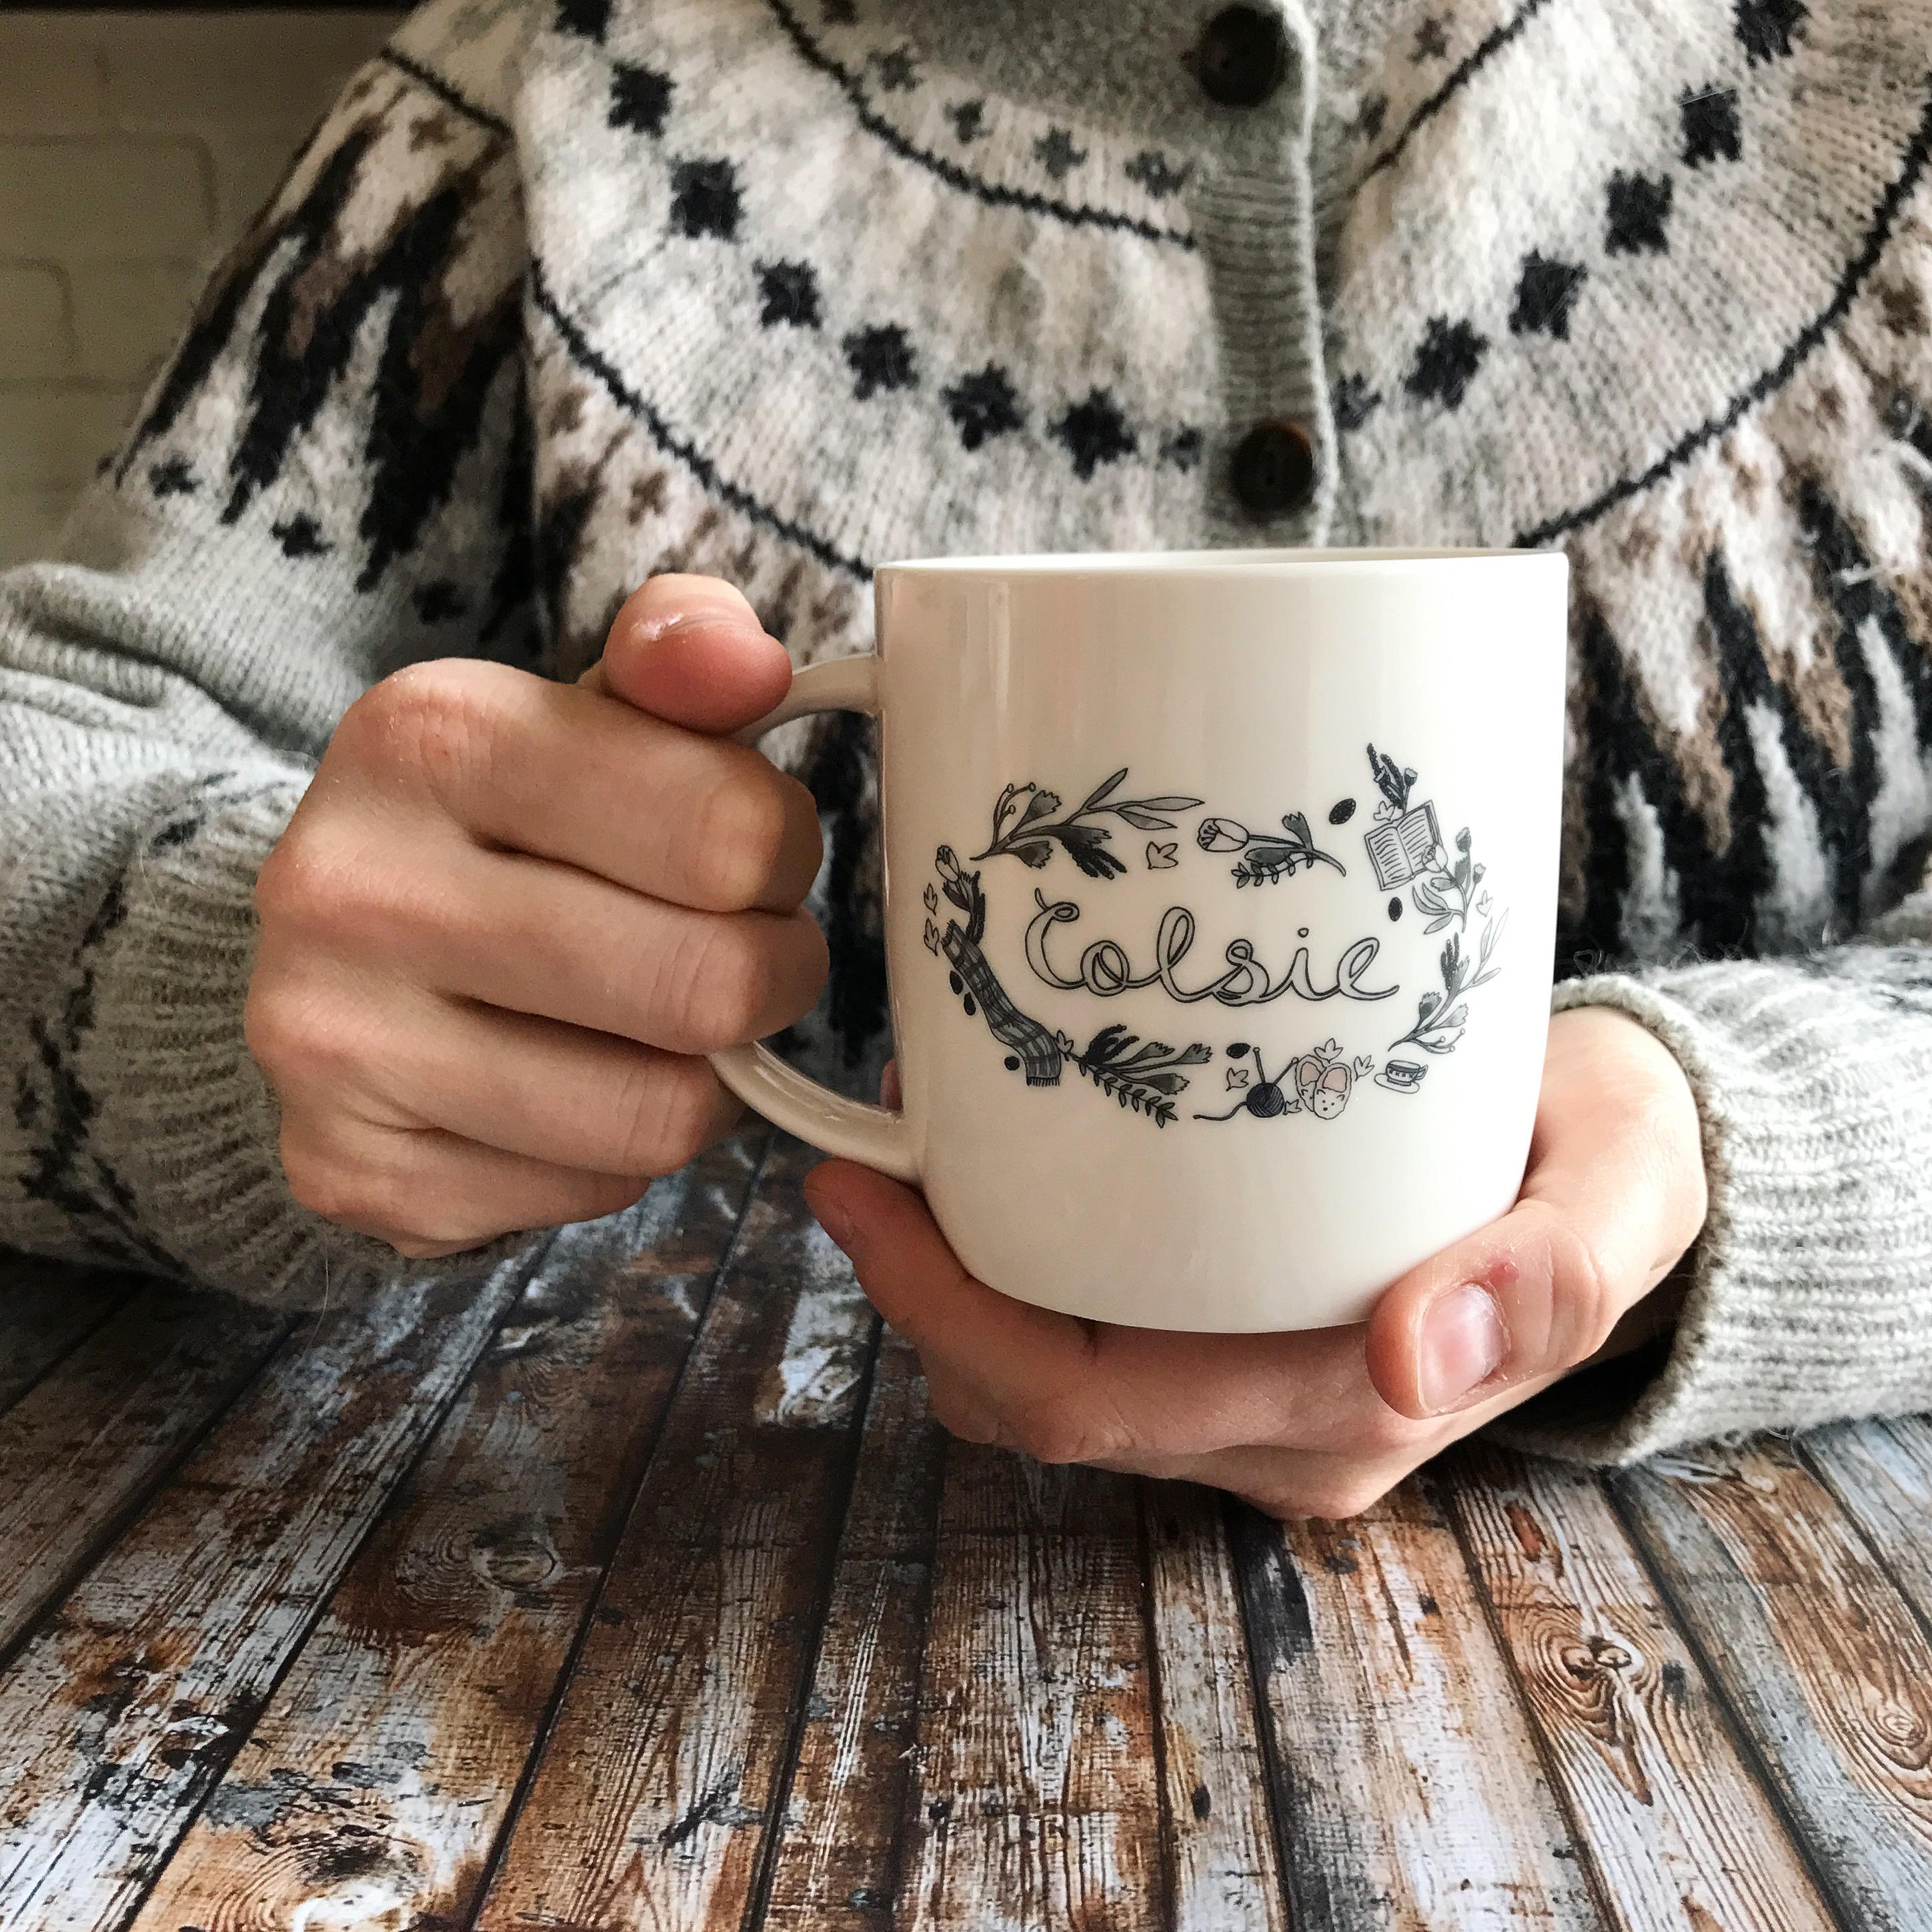 colsie mug